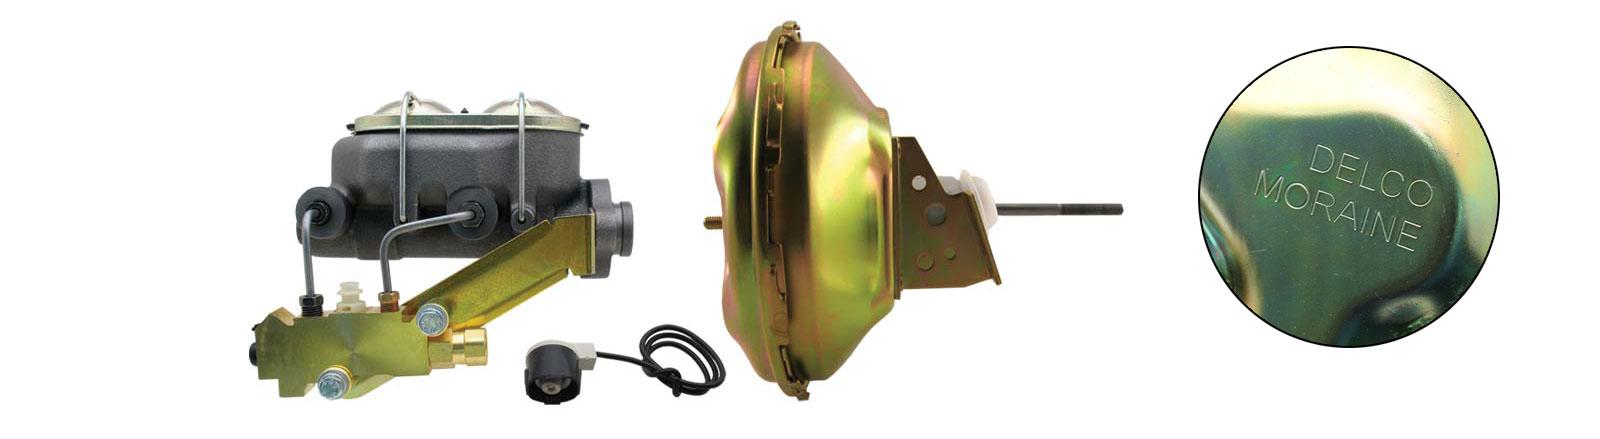 GM-224 - GM A, F, X 11 Single Delco Moraine O.E.M. Stamped Power Brake Booster Conversion Kit (Disc/ Drum)